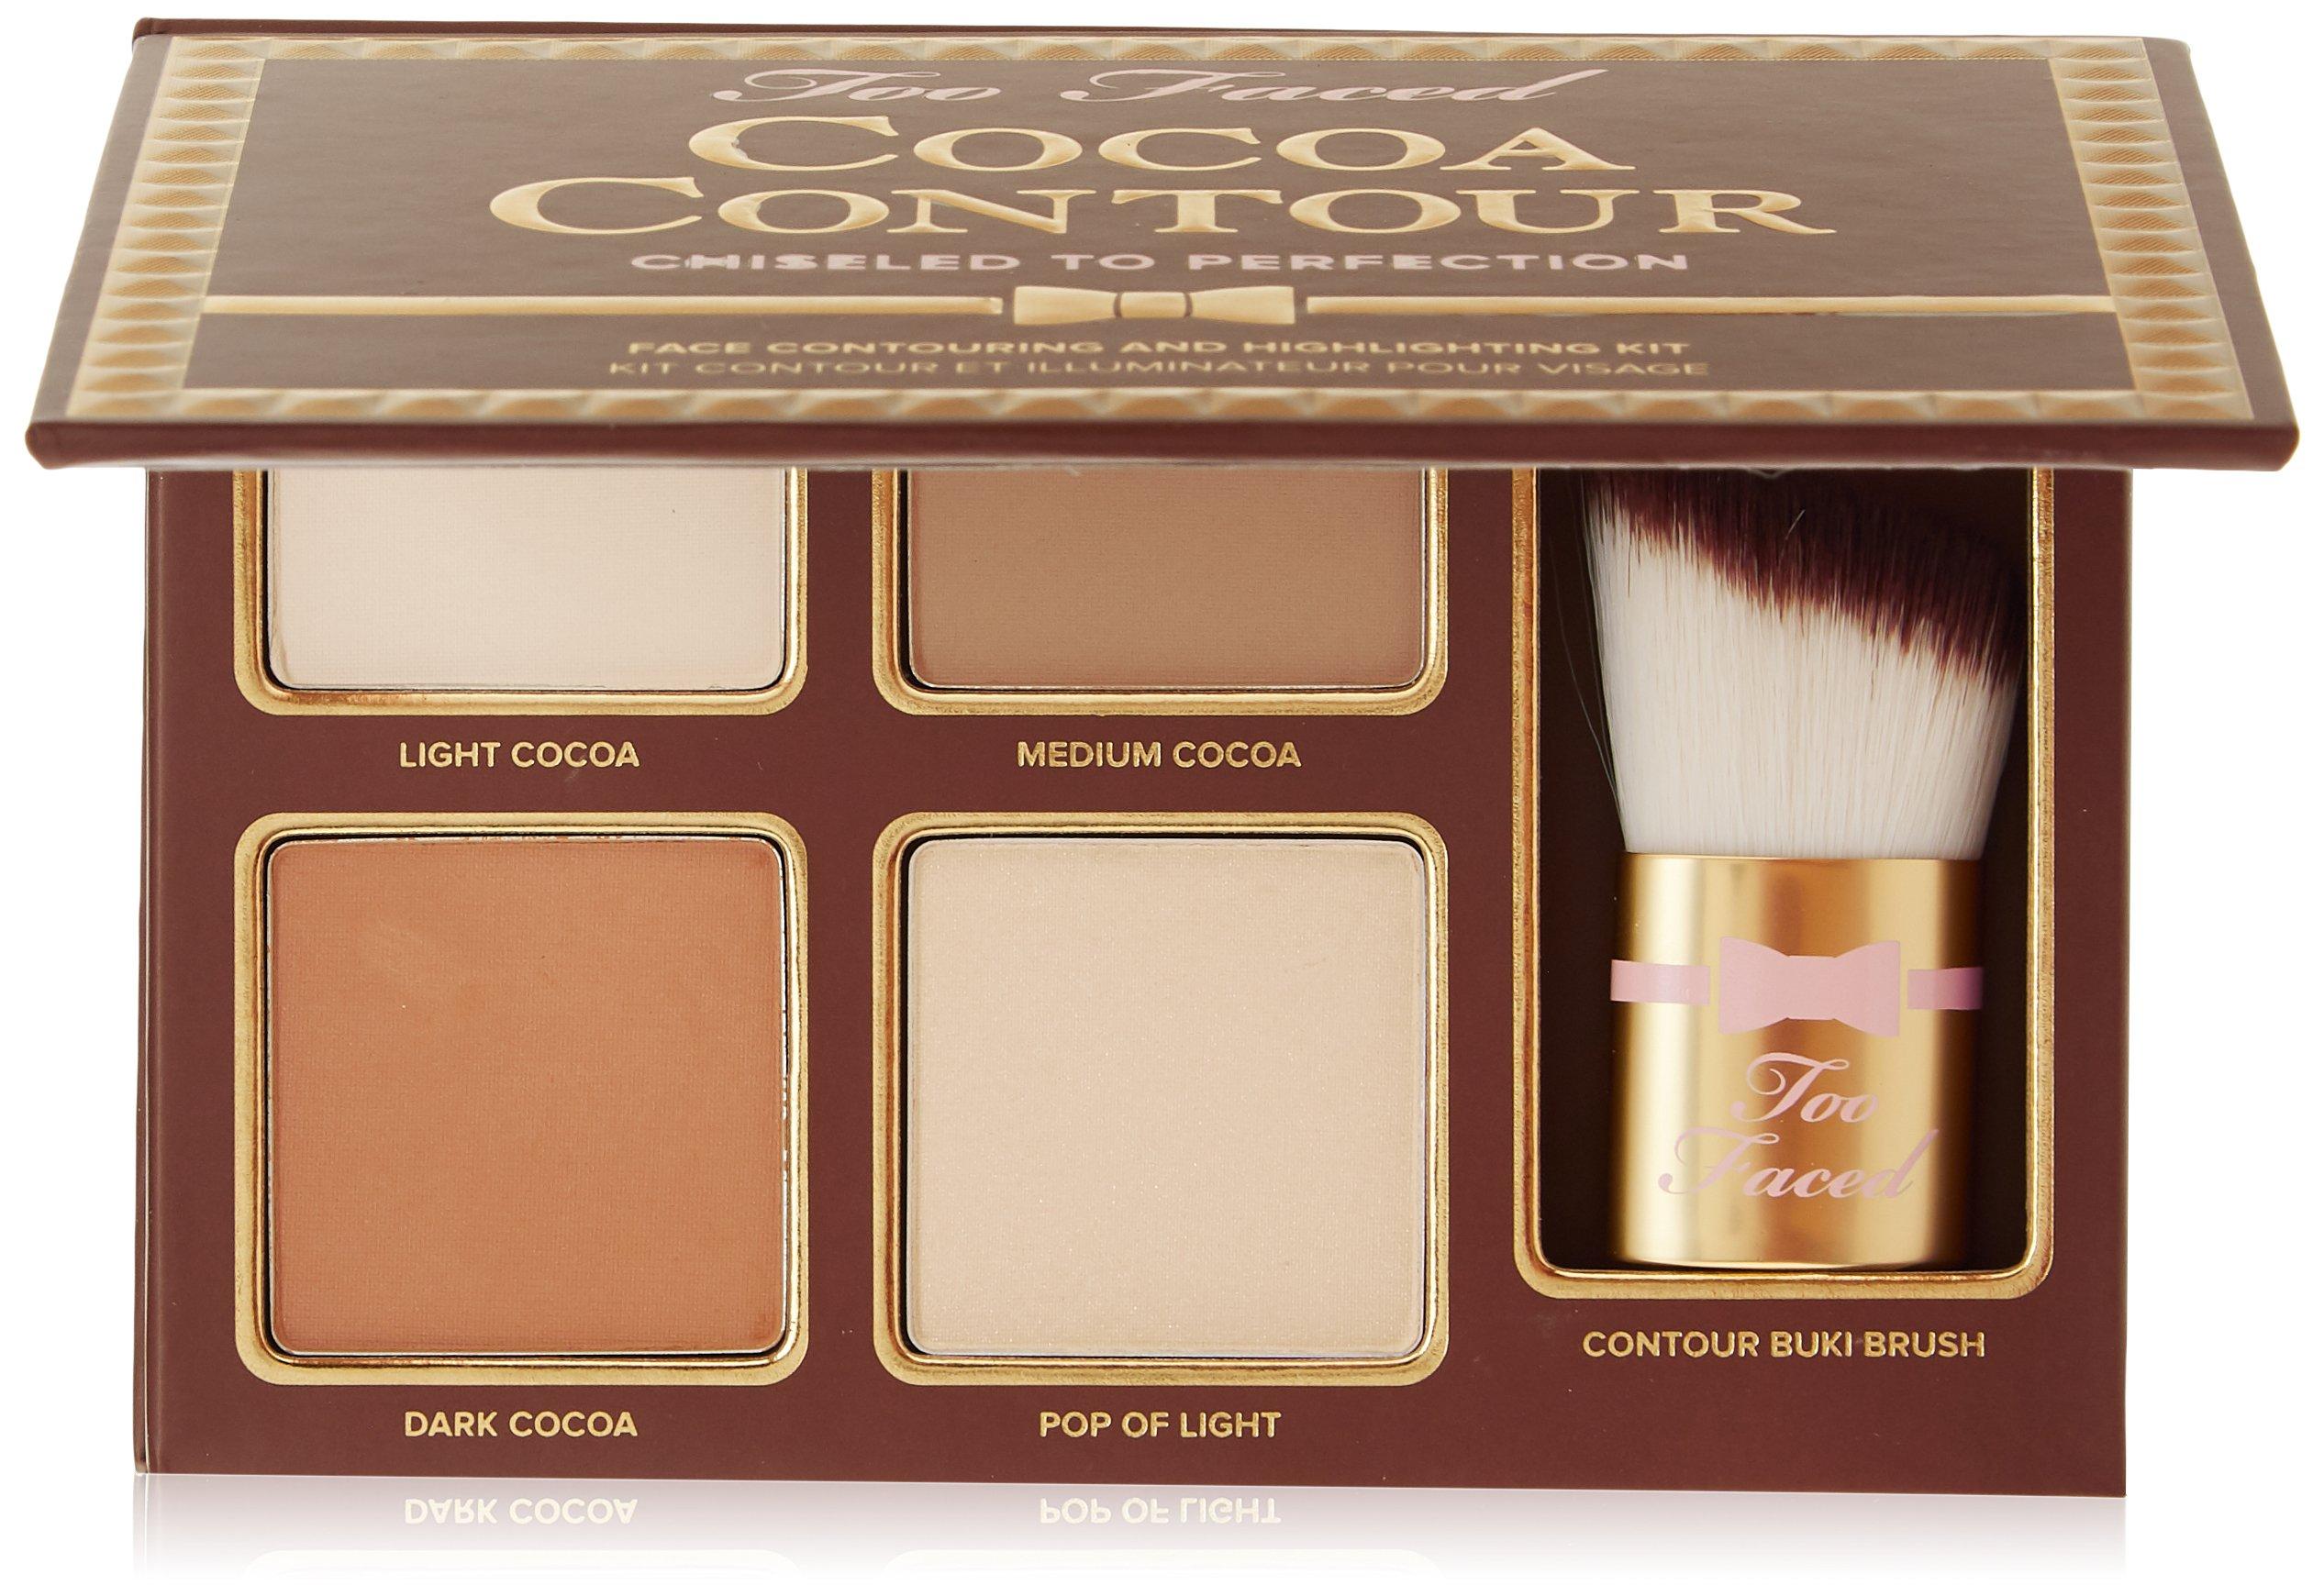 Too Faced Cocoa Contour Chiseled To Perfection Beauty Kuas Mascara Shadow Anastasia